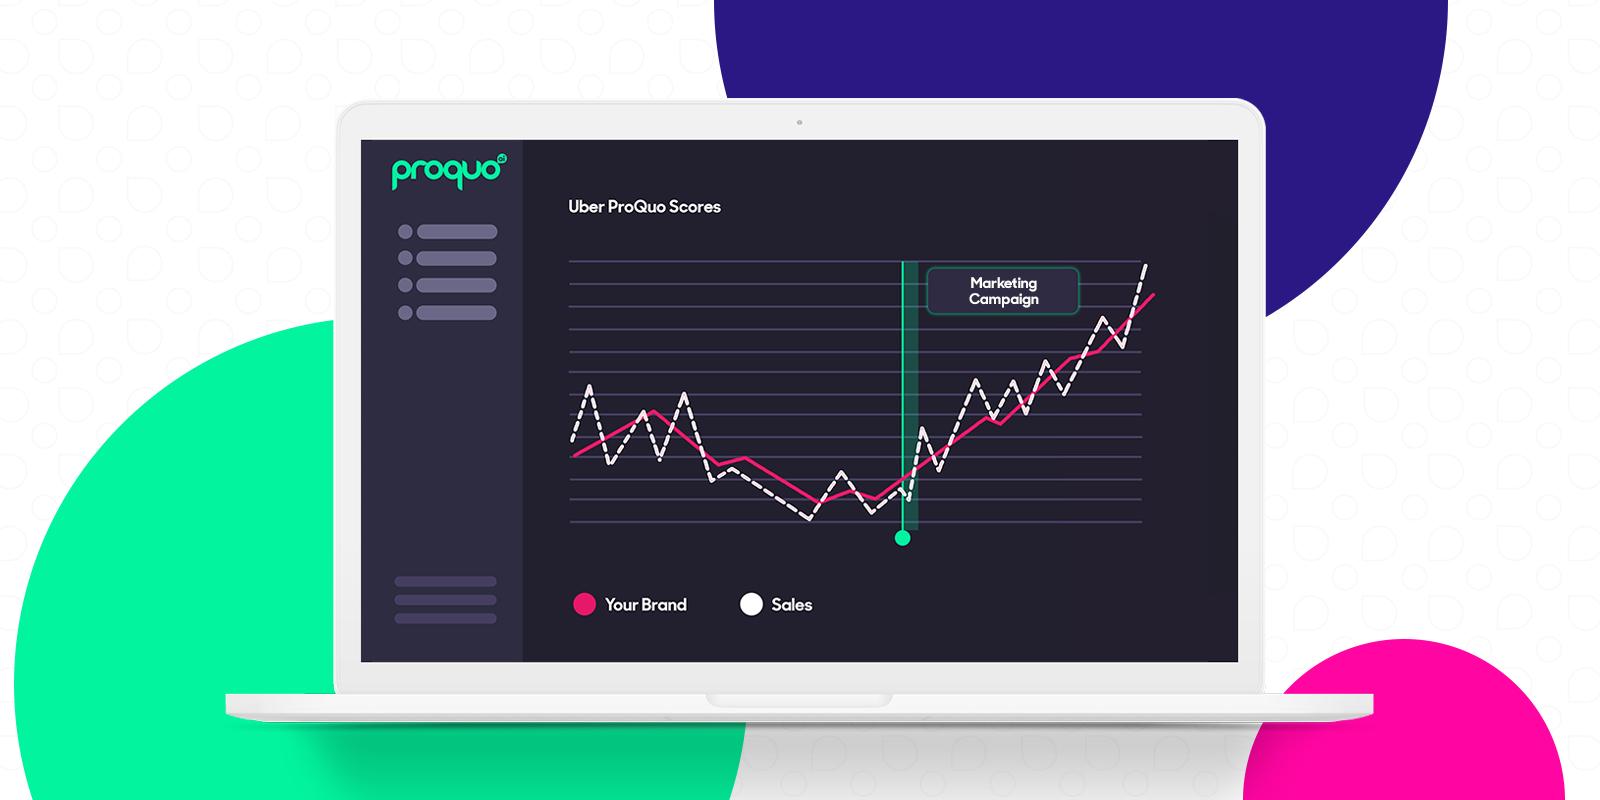 brand management platform, AI, showing marketing growing against sales